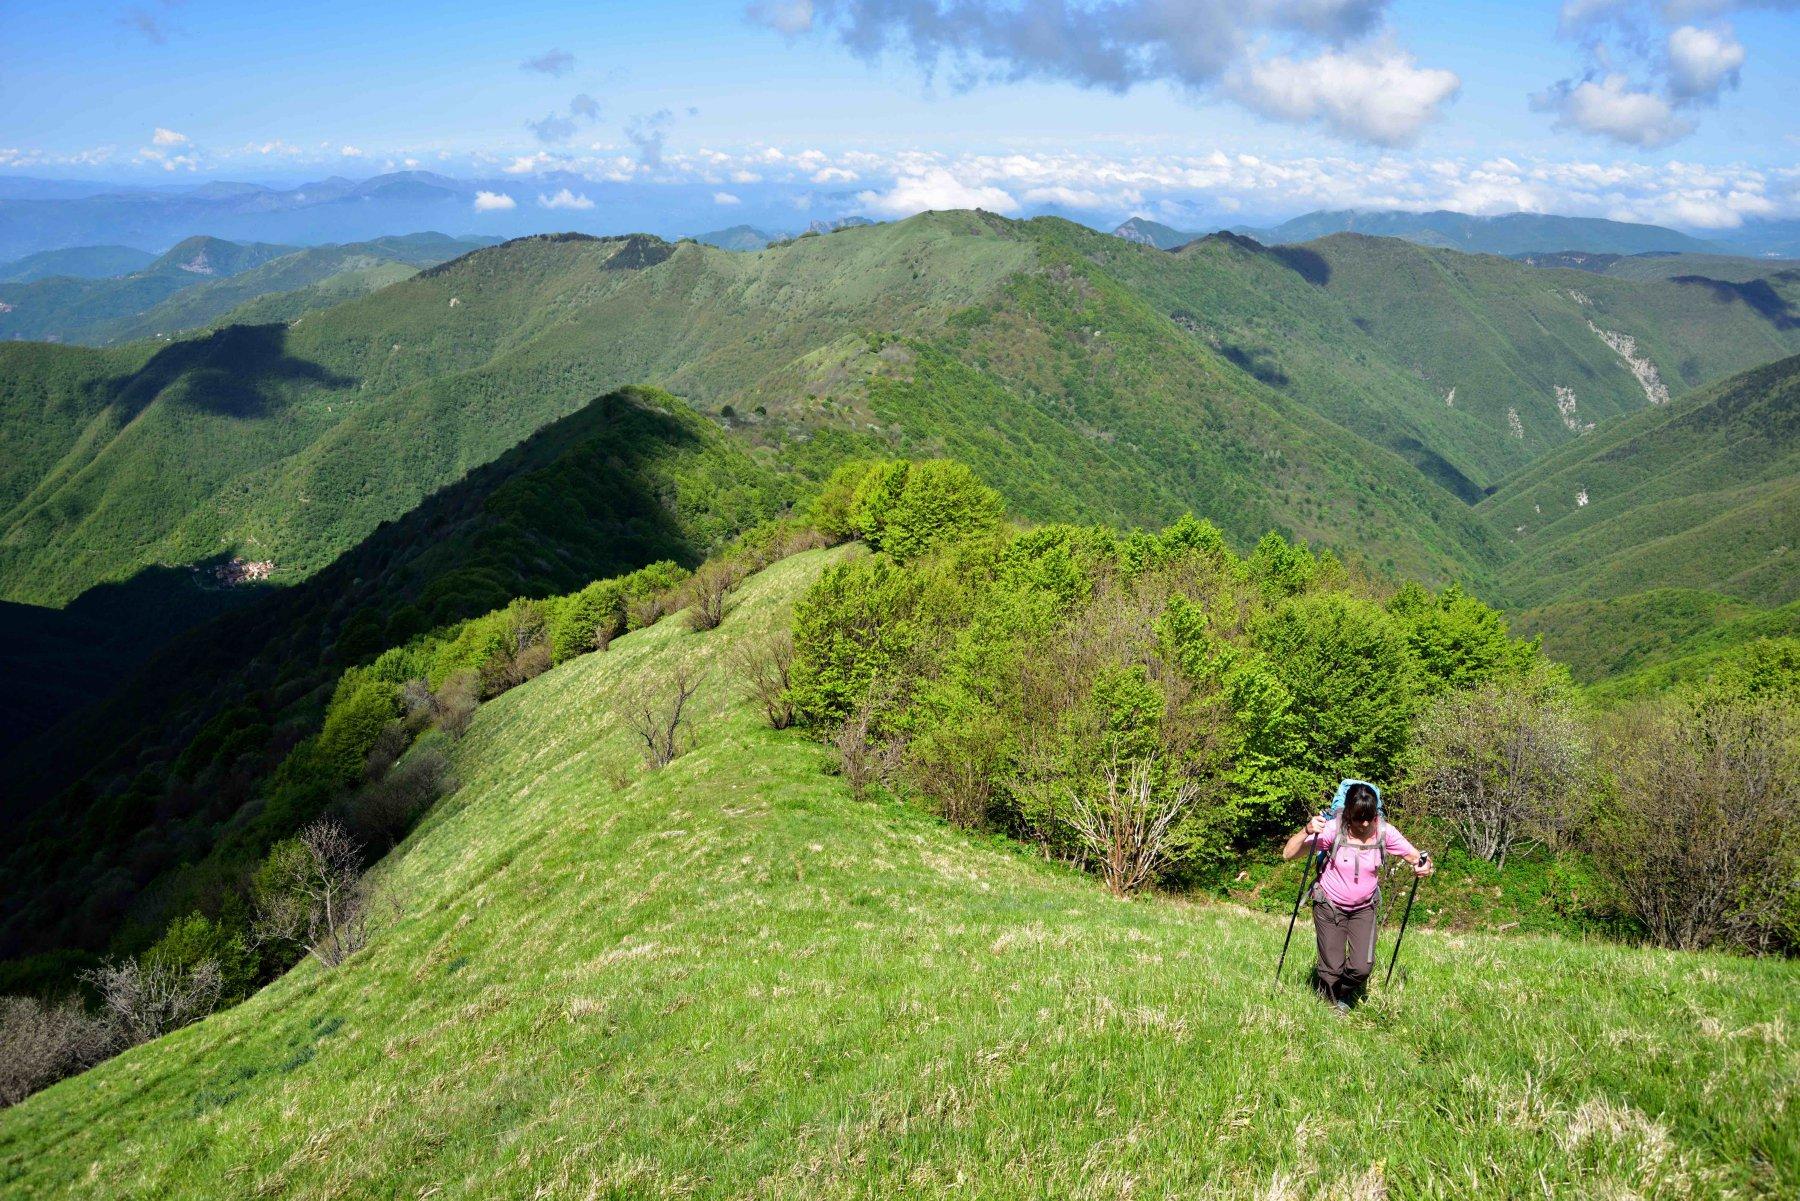 Cresta ovest M.Antola